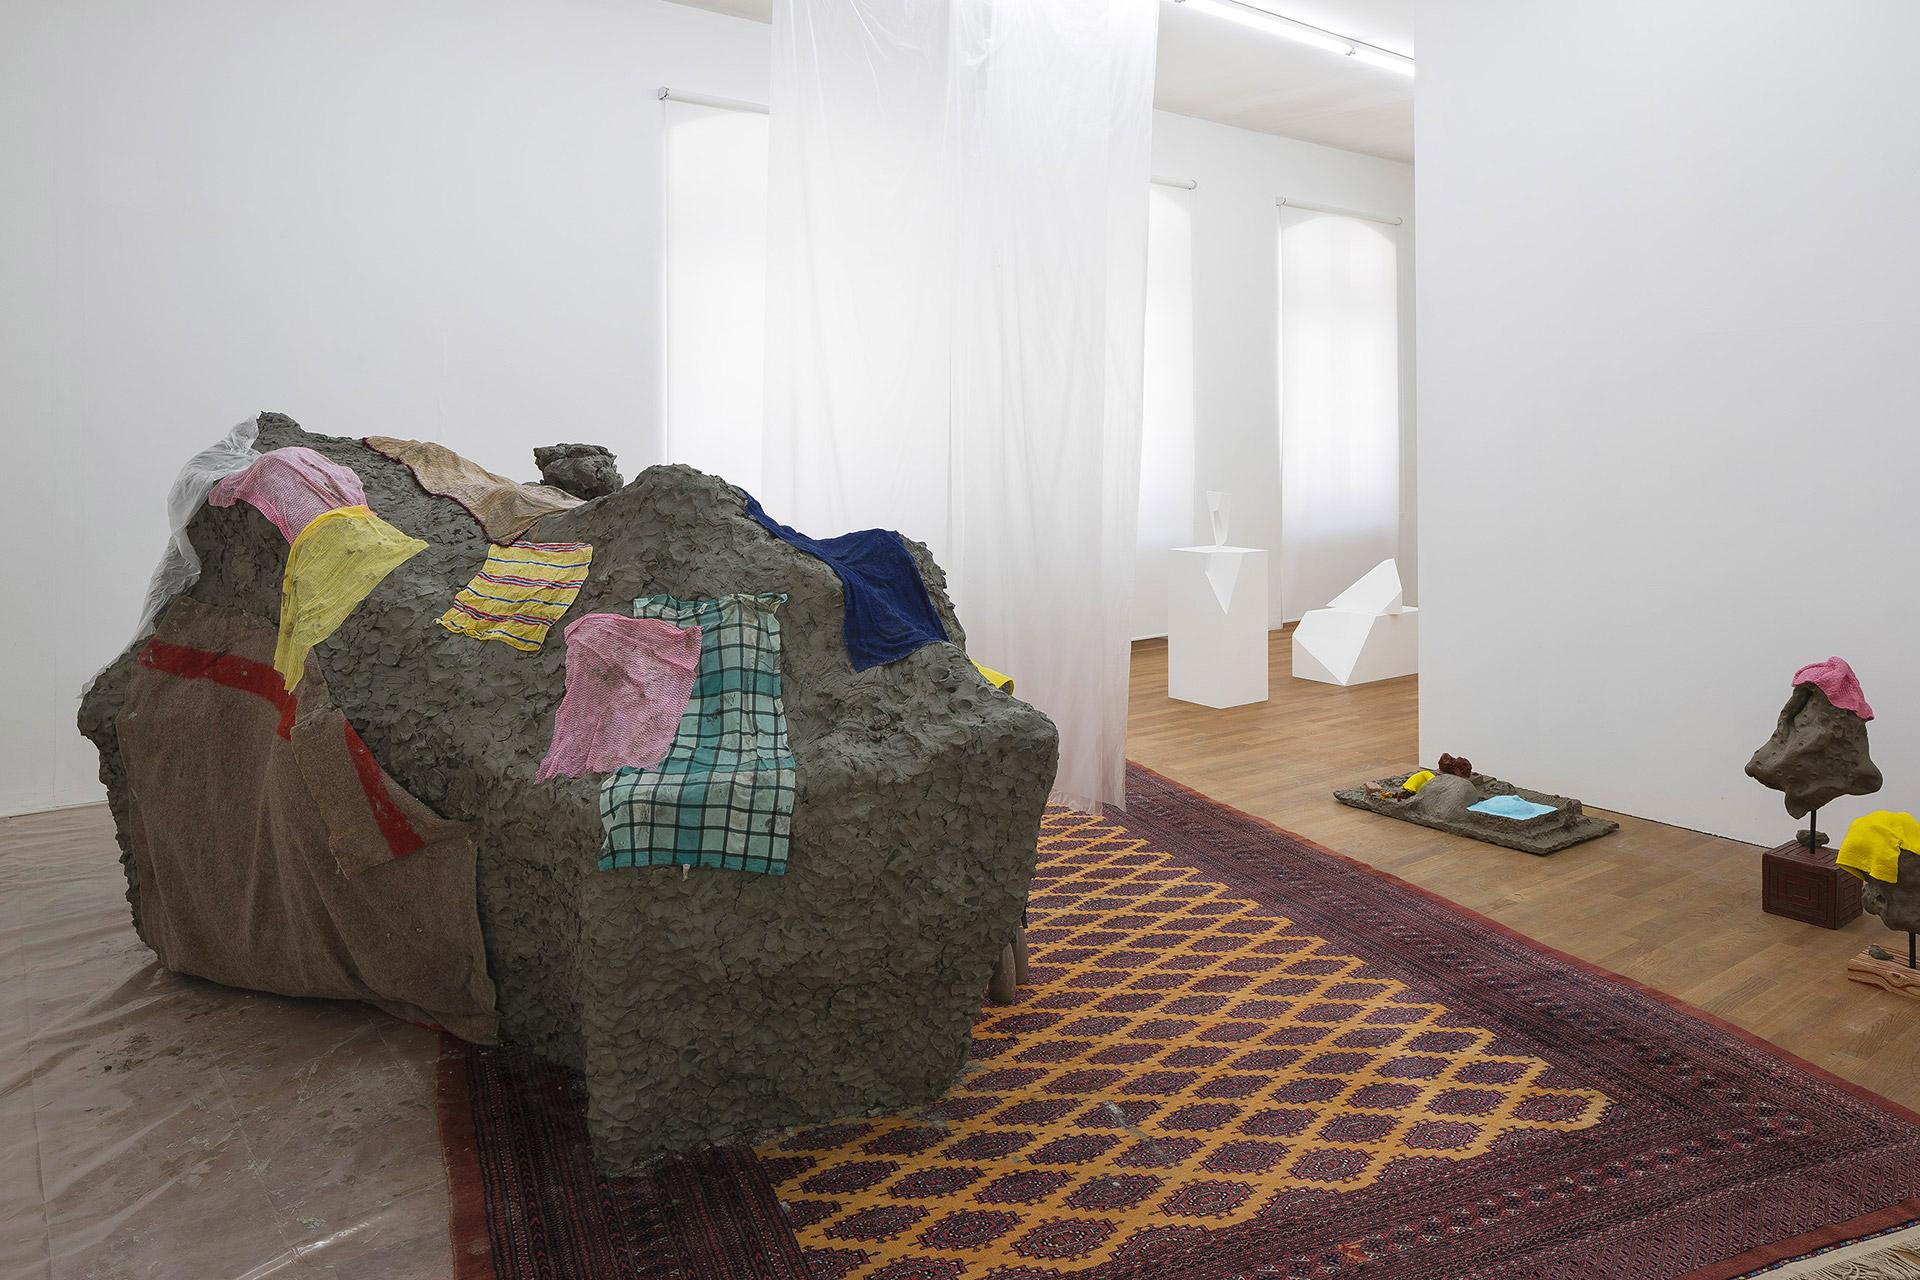 Gianin-Conrad-Kunsthalle-Winterthur-2015-1.jpg